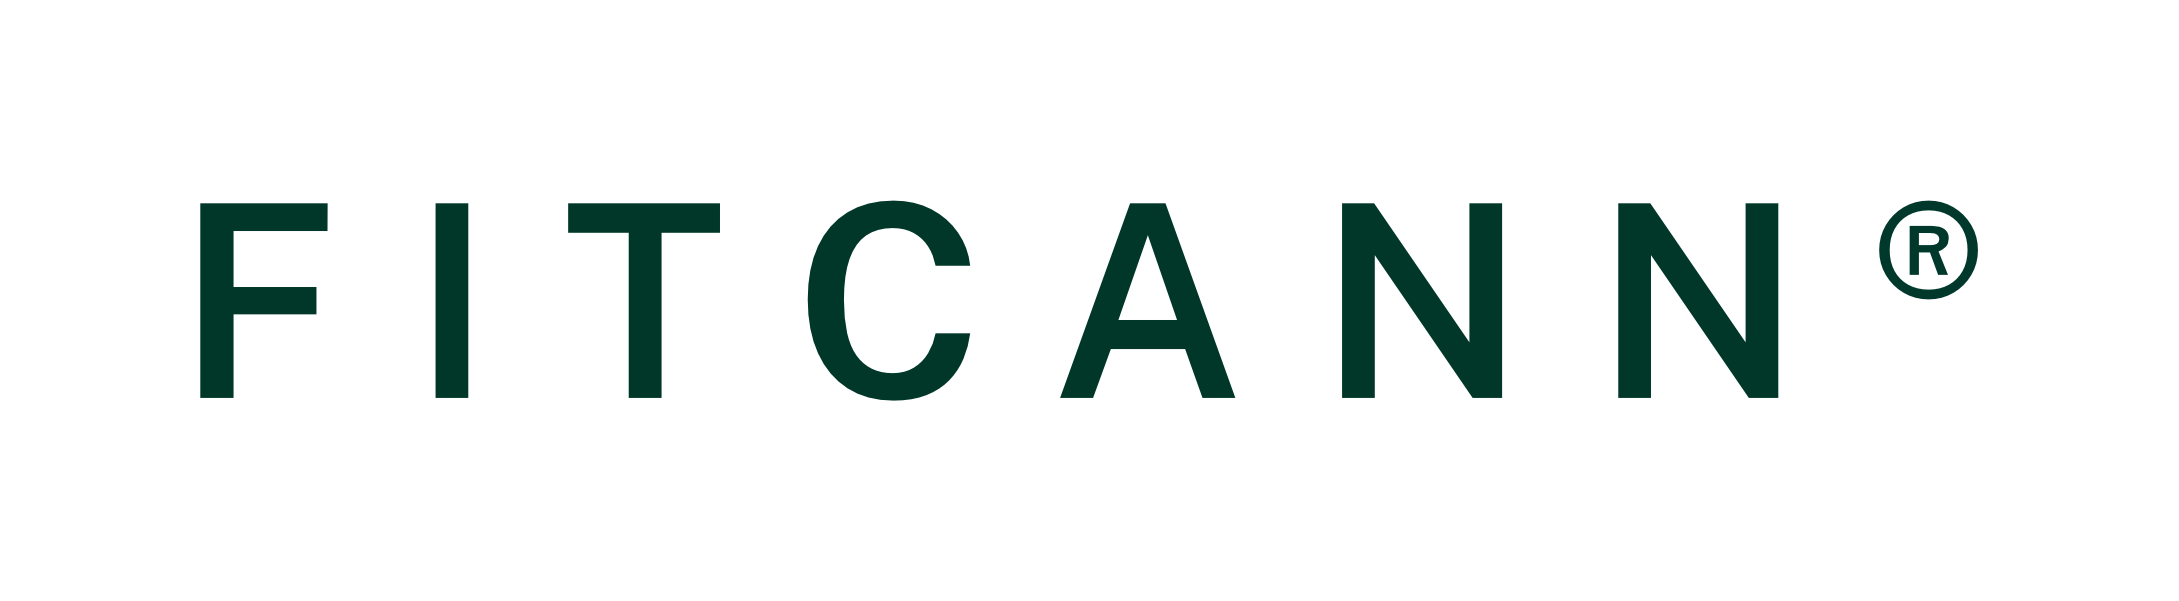 Fitcann_R_Logotype_Emerald